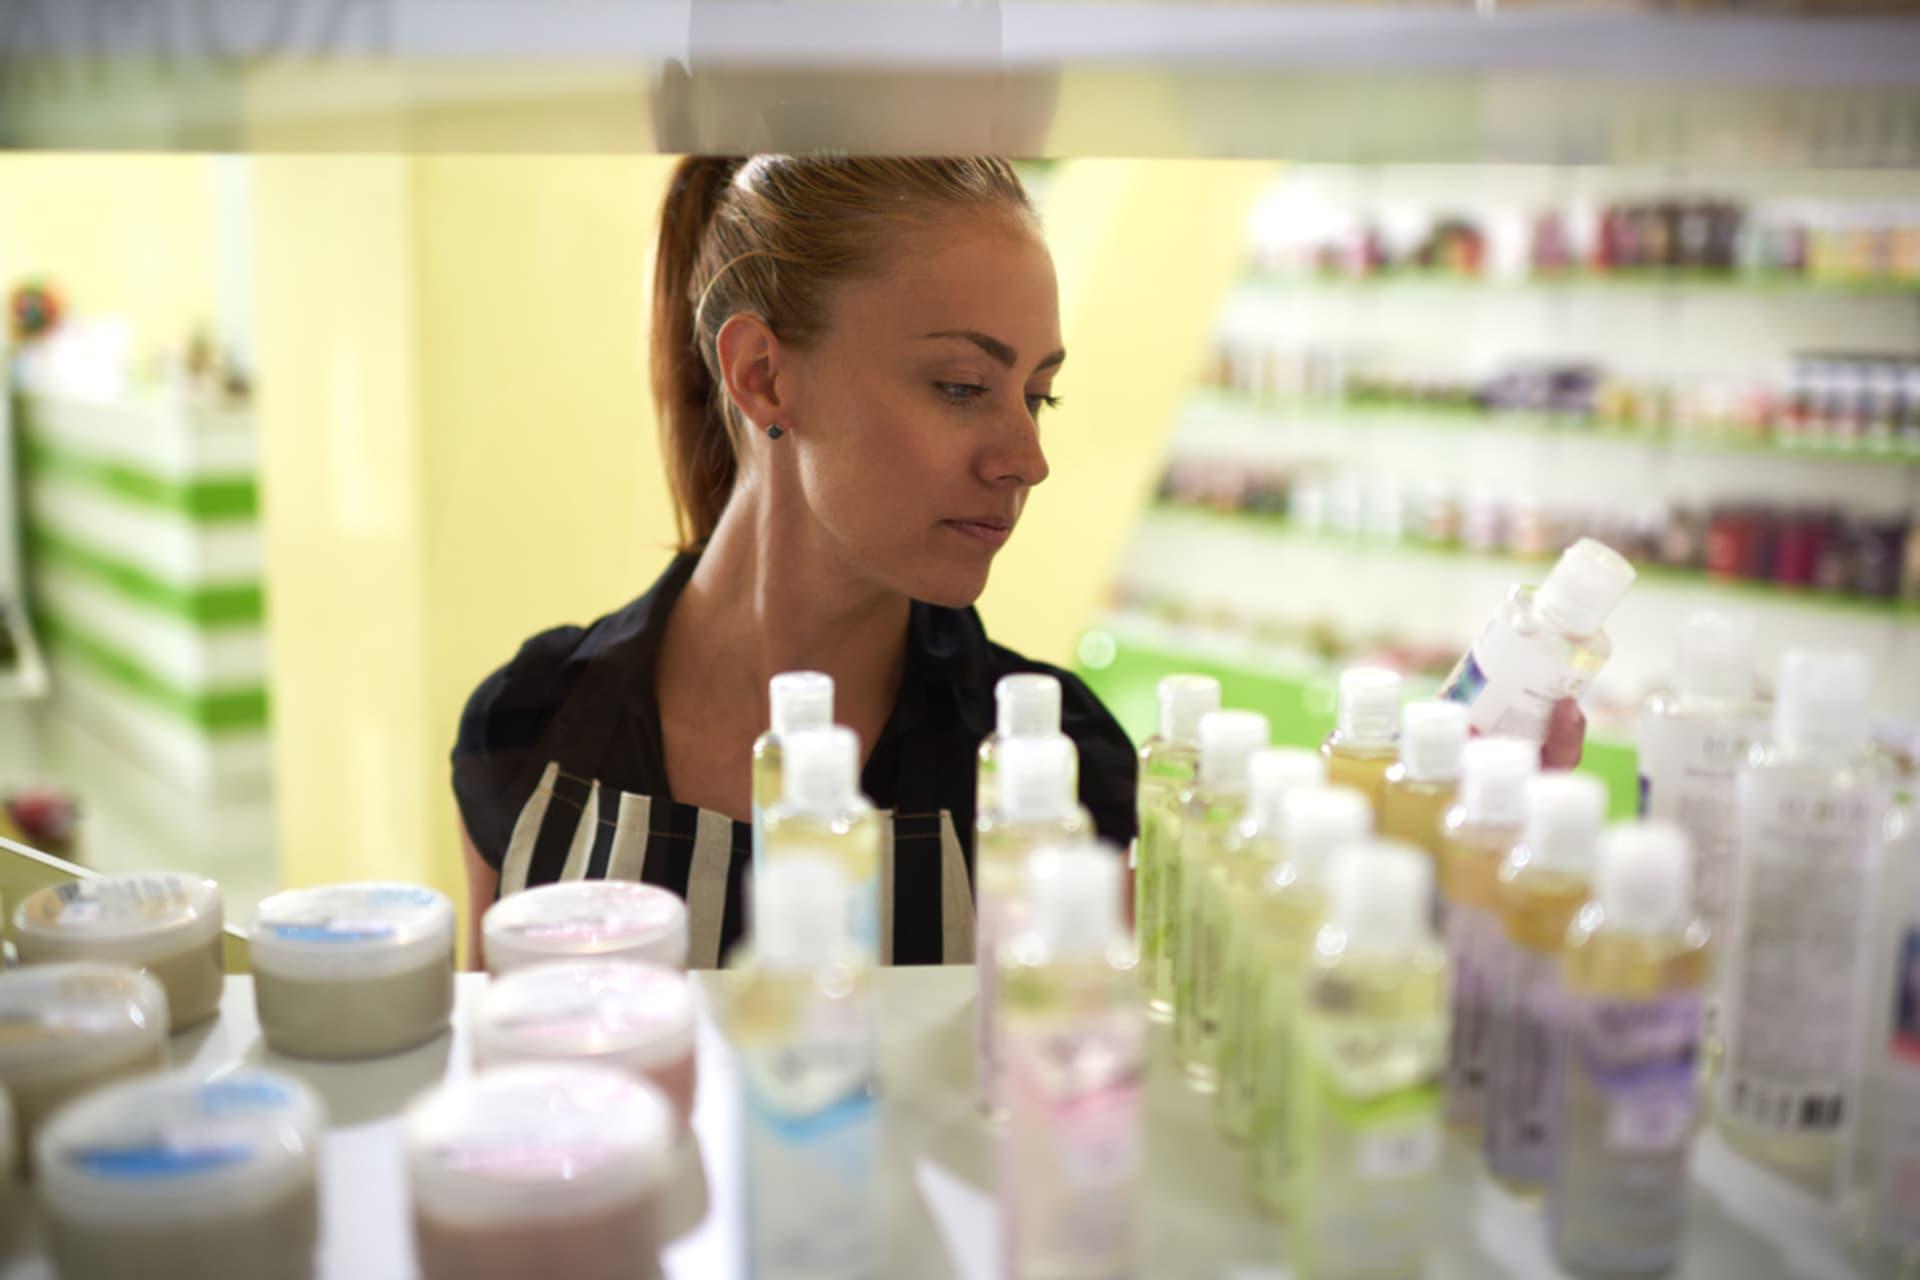 Kosmetik Regal Gaudi Lab shutterstock 318315056